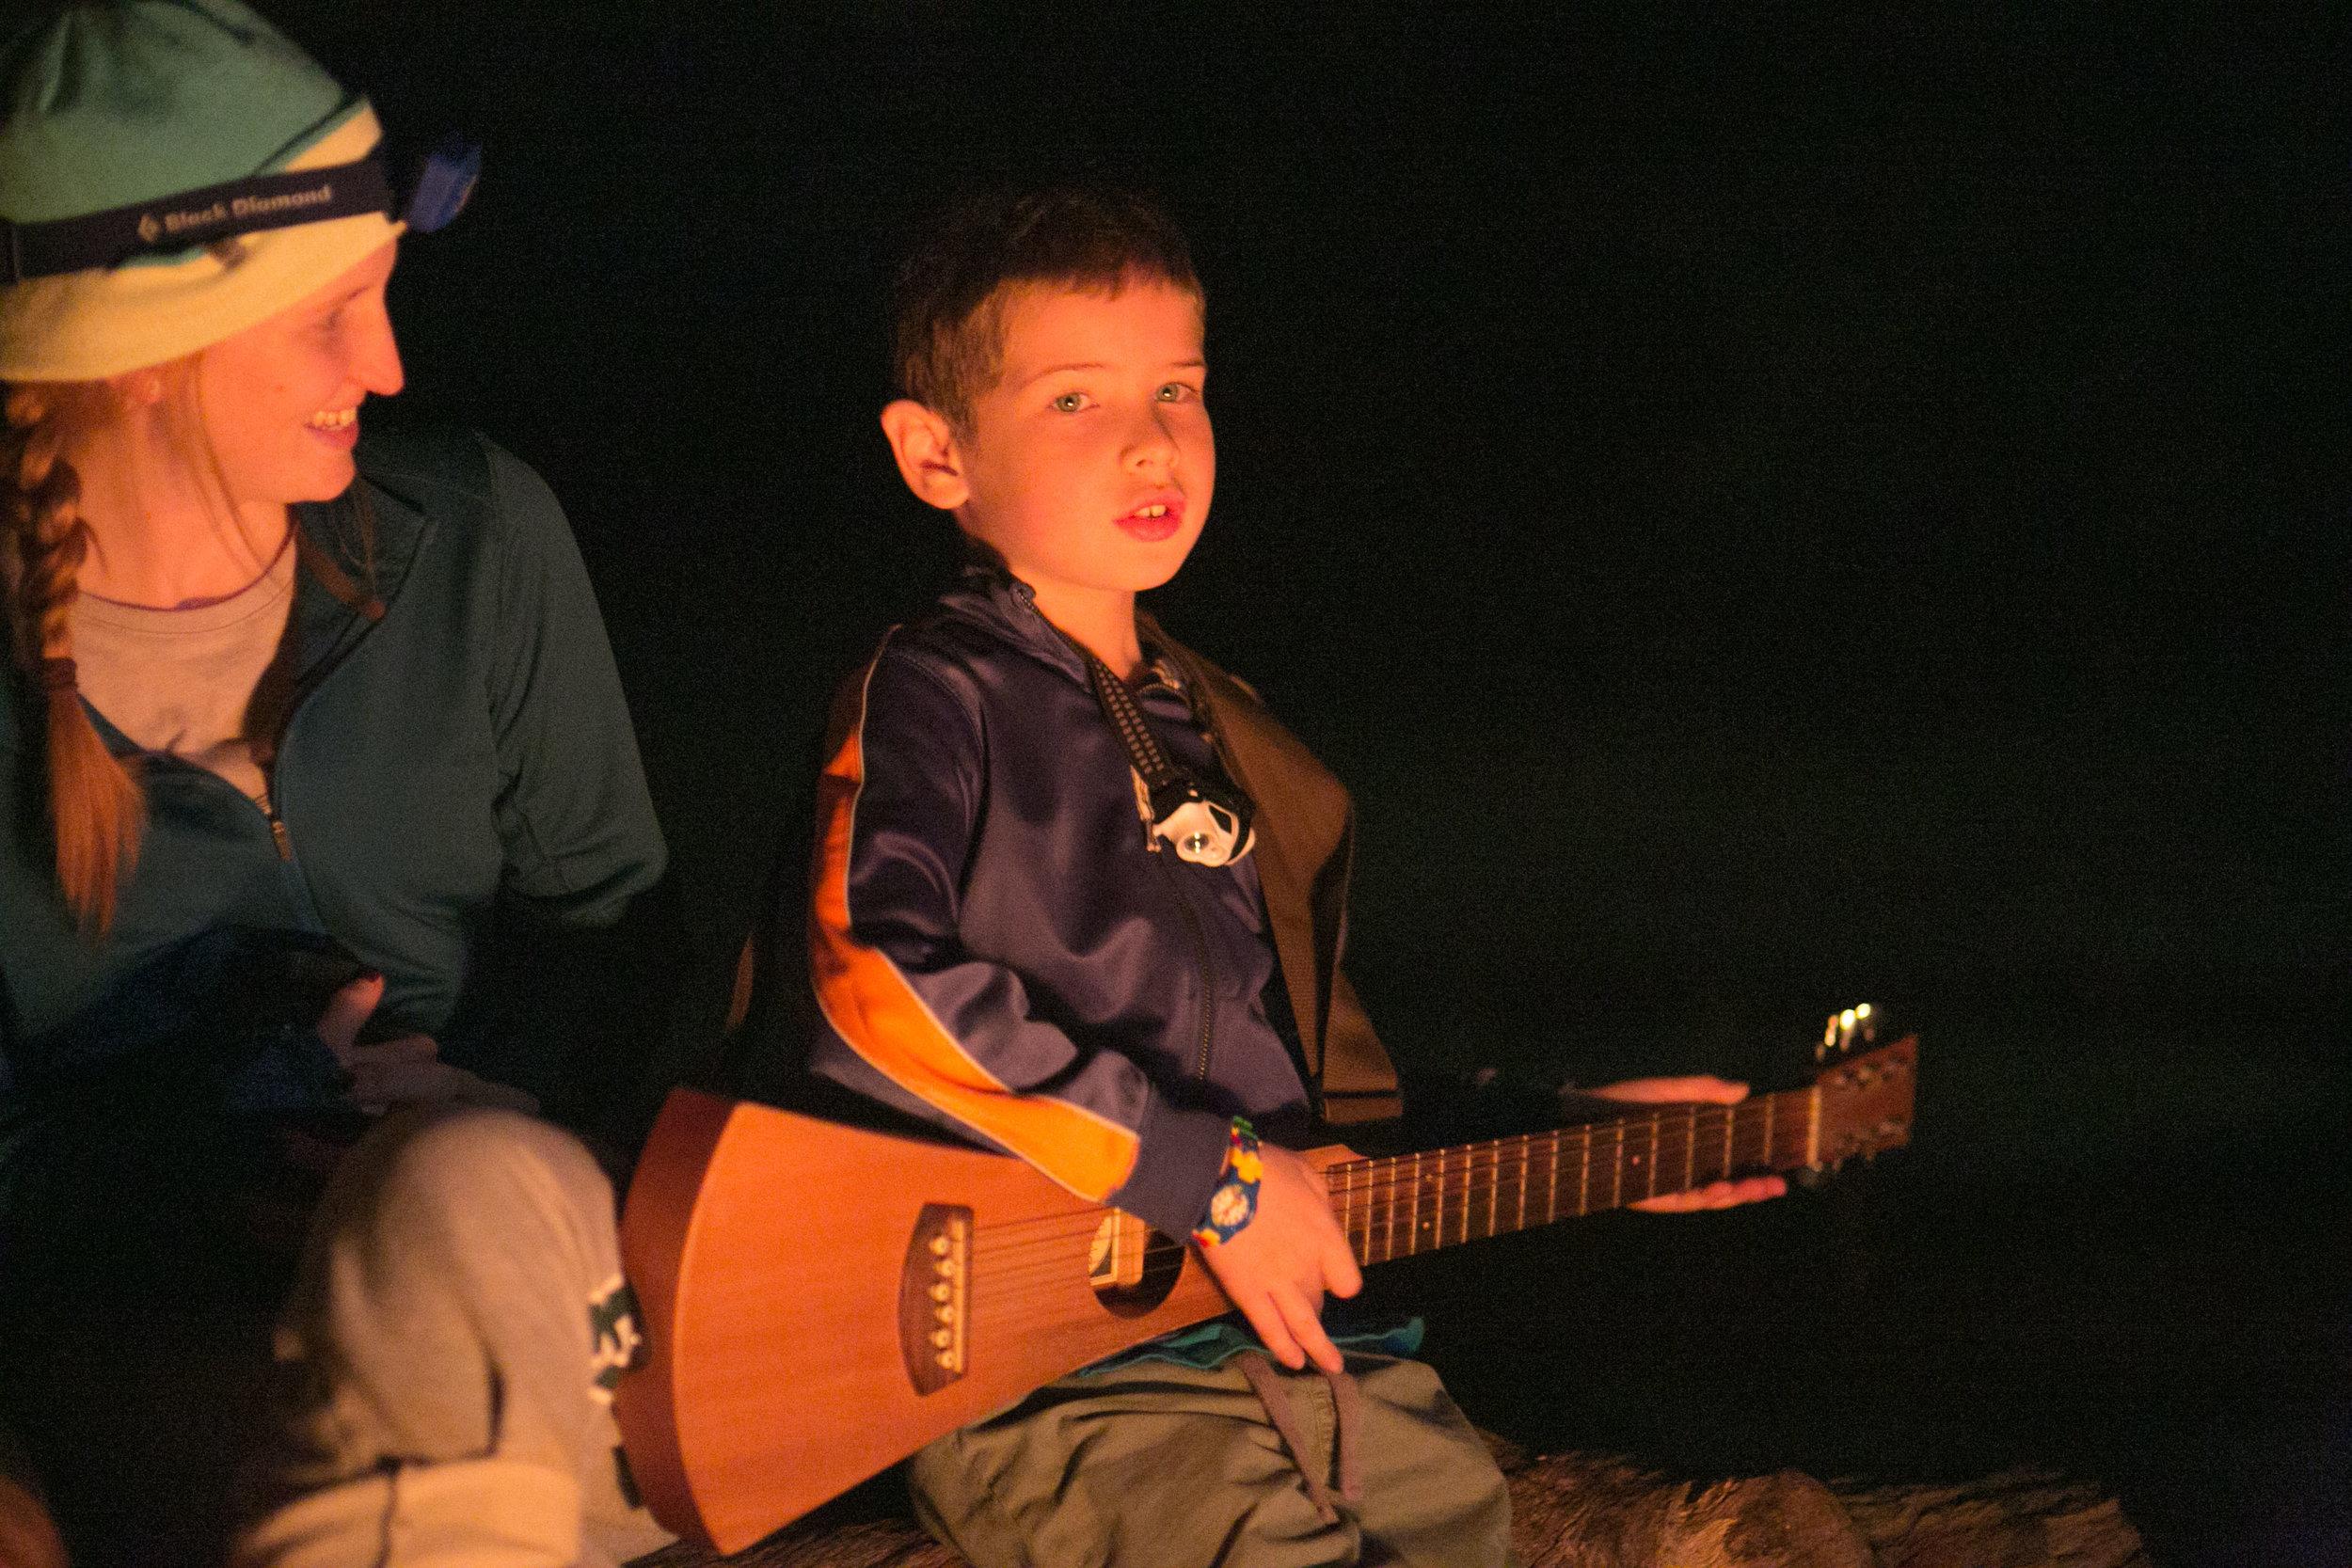 Daniel did a great job on singing!